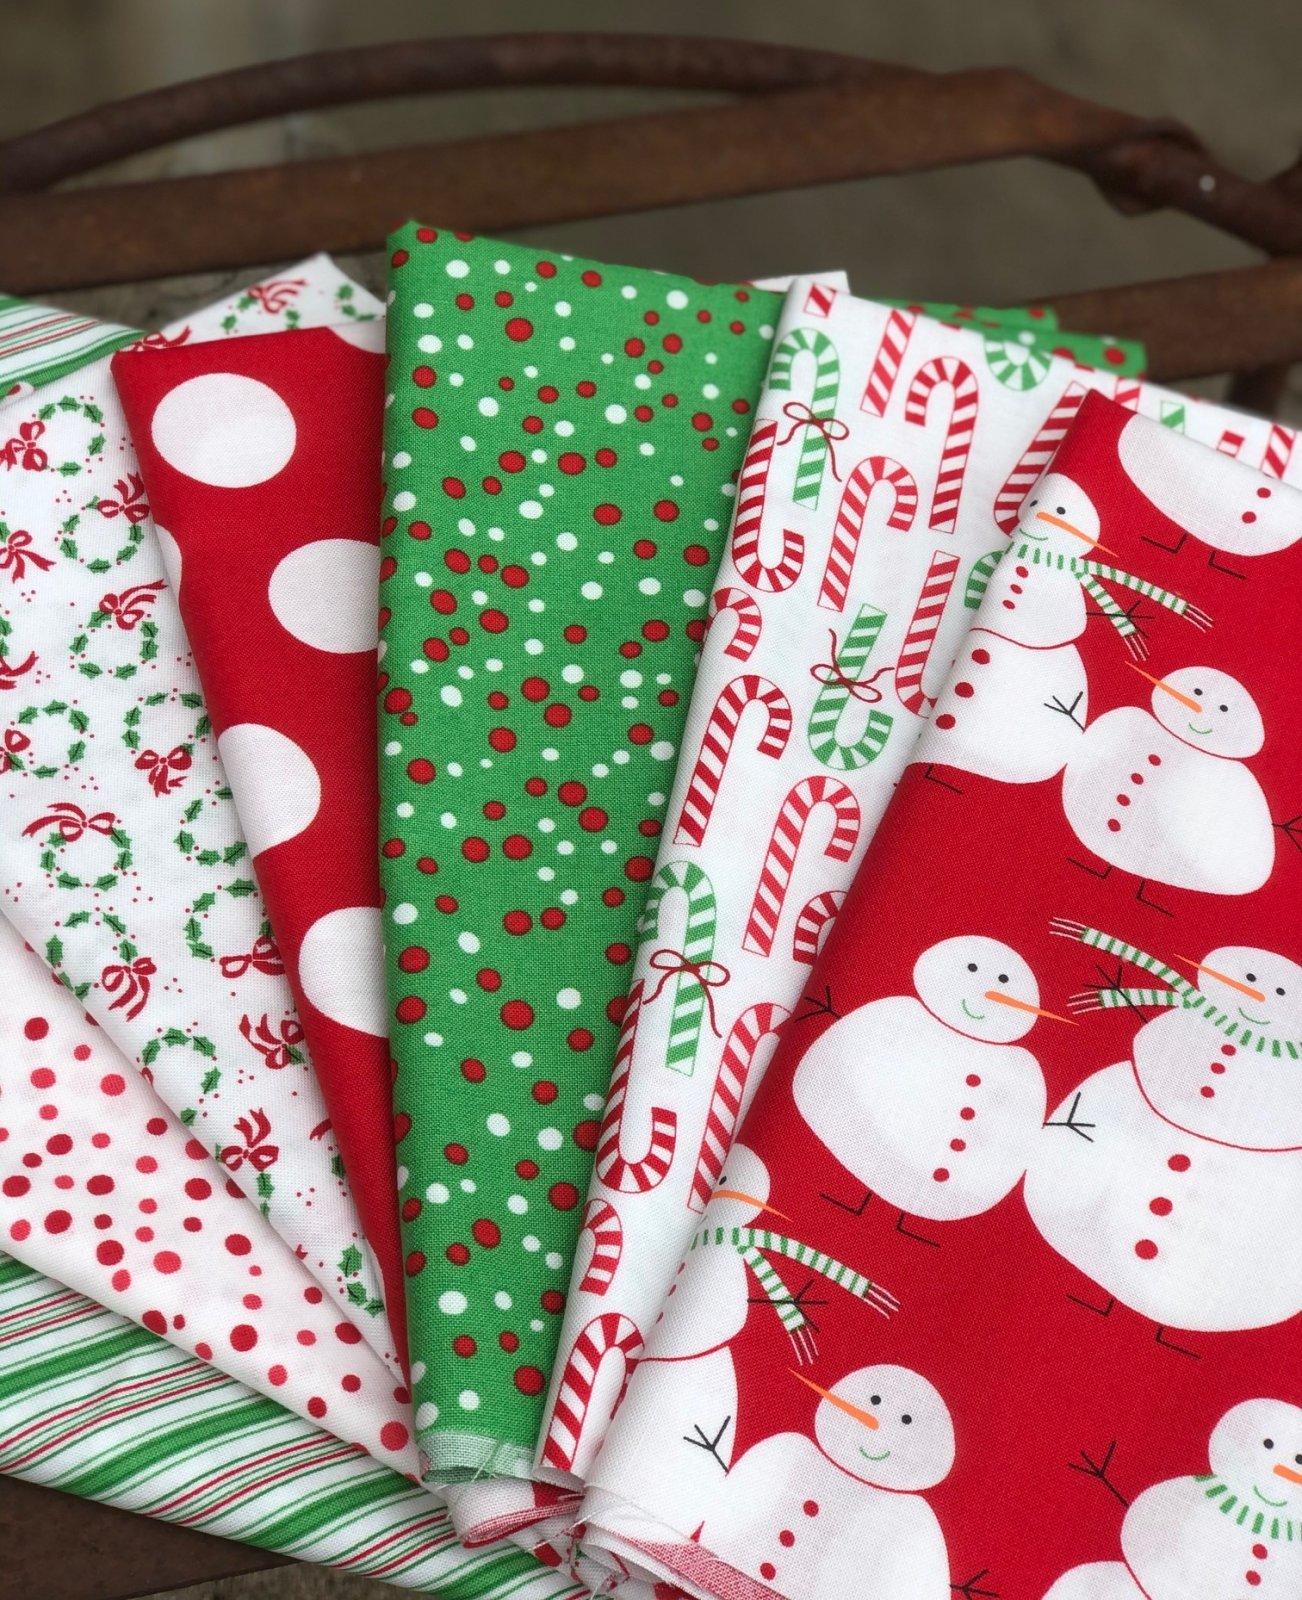 Merry Bright Red Snowman Fat Quarter Bundle (7)